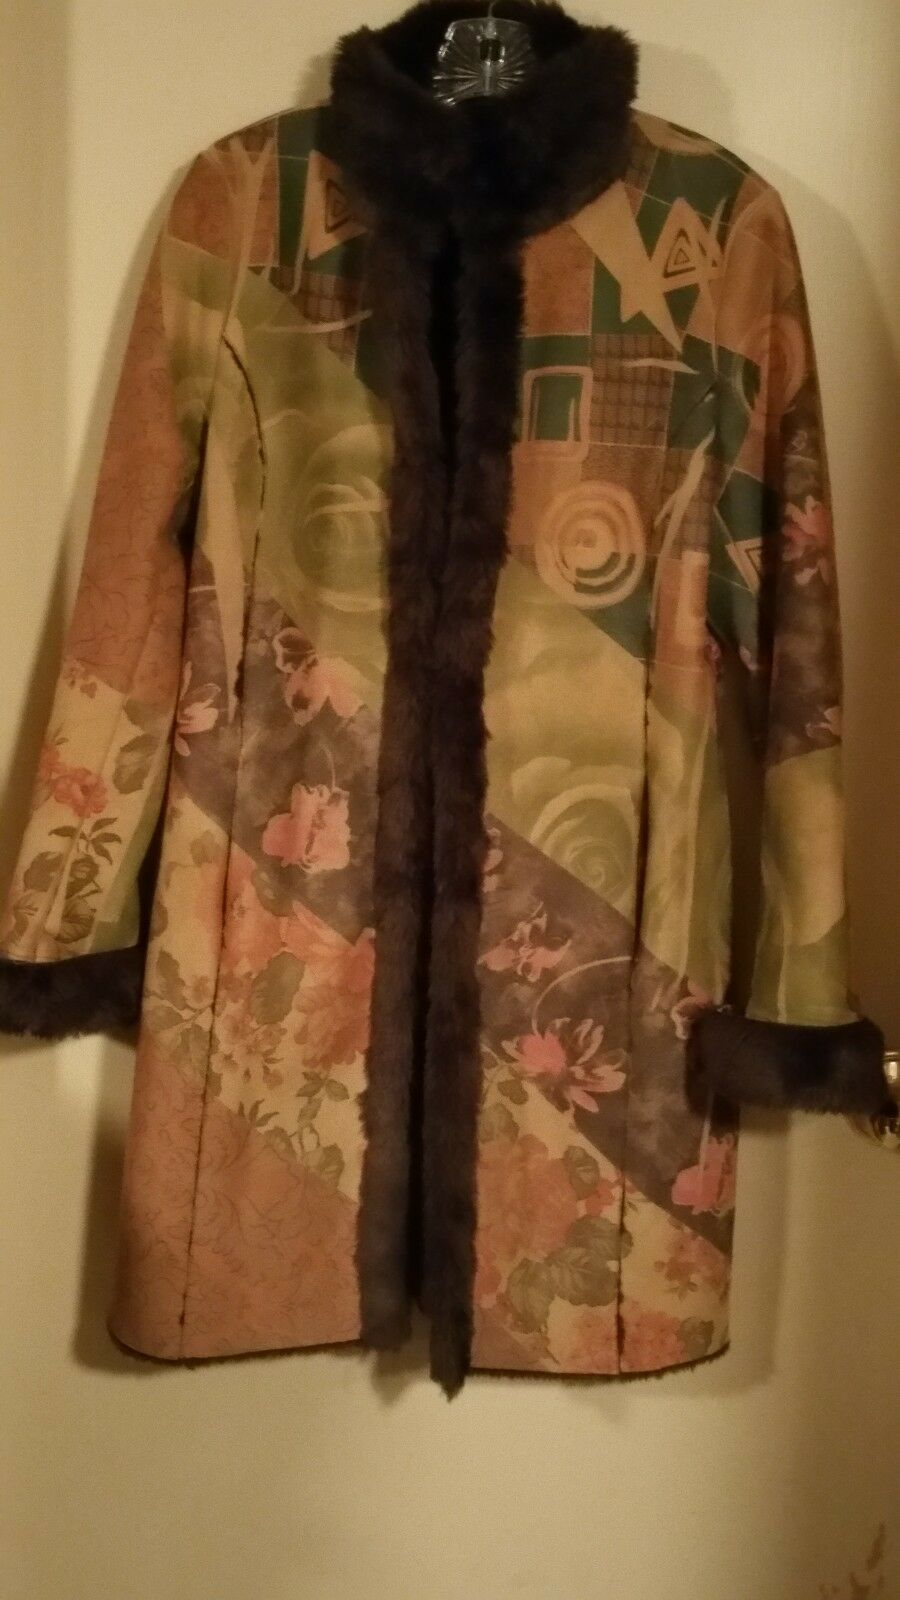 Colorido Lapis Gamuza como abrigo piel sintética abrigo forrado con  puño XL (L) Perfecto Estado  nuevo listado